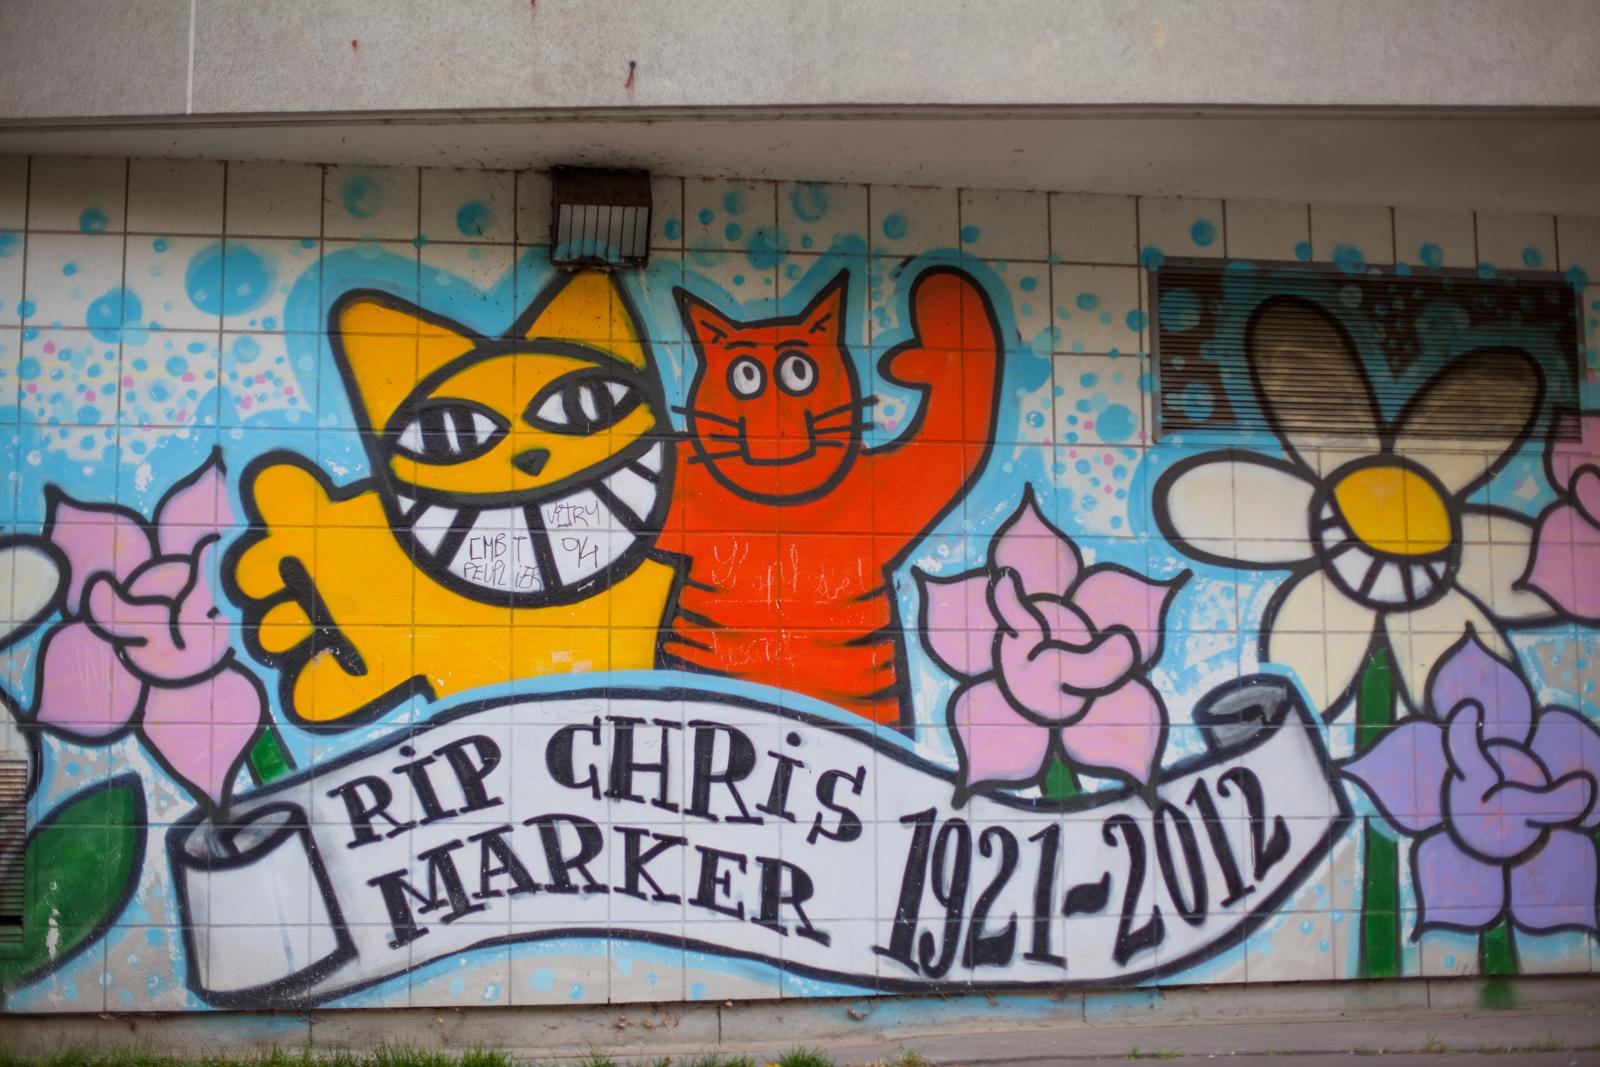 street art vitry-sur-seine, street art vitry, street art val-de-marne, street art banlieue paris, art urbain vitry, art urbain vitry-sur-seine, art urbain vitry, le guide du street art à paris, stéphanie lombard, M. CHAT